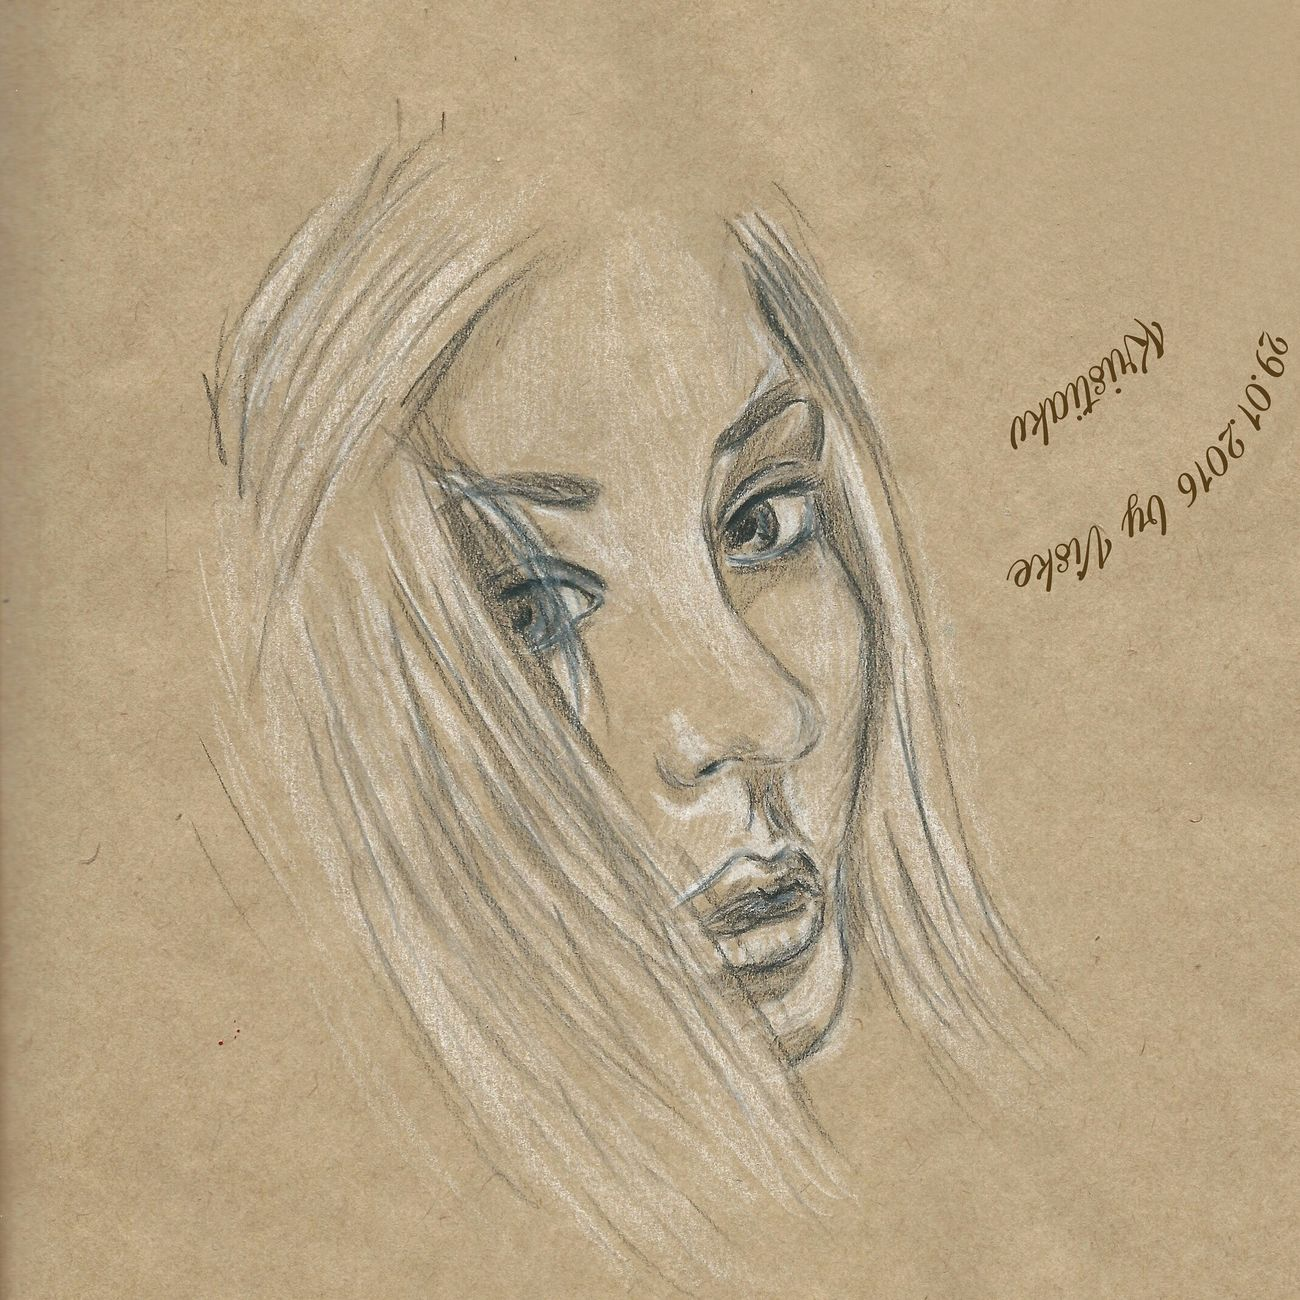 Art, Drawing, Creativity One Person Free девушка рисунок портрет рисунок карандашом автопортрет Face Art арт